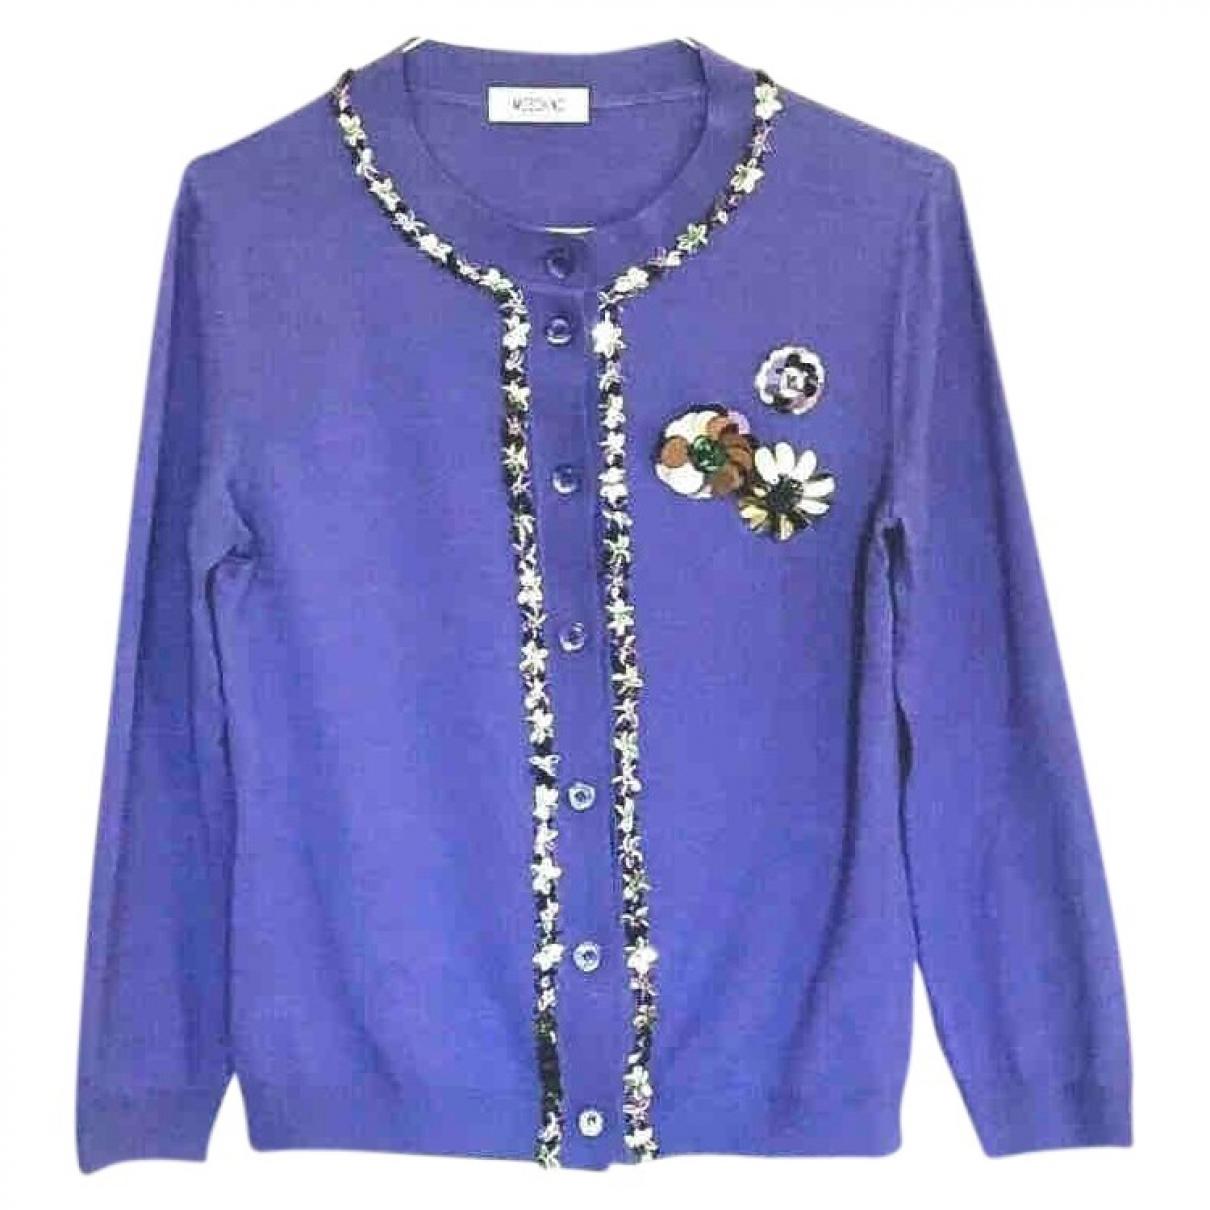 Moschino - Pull   pour femme en laine - violet